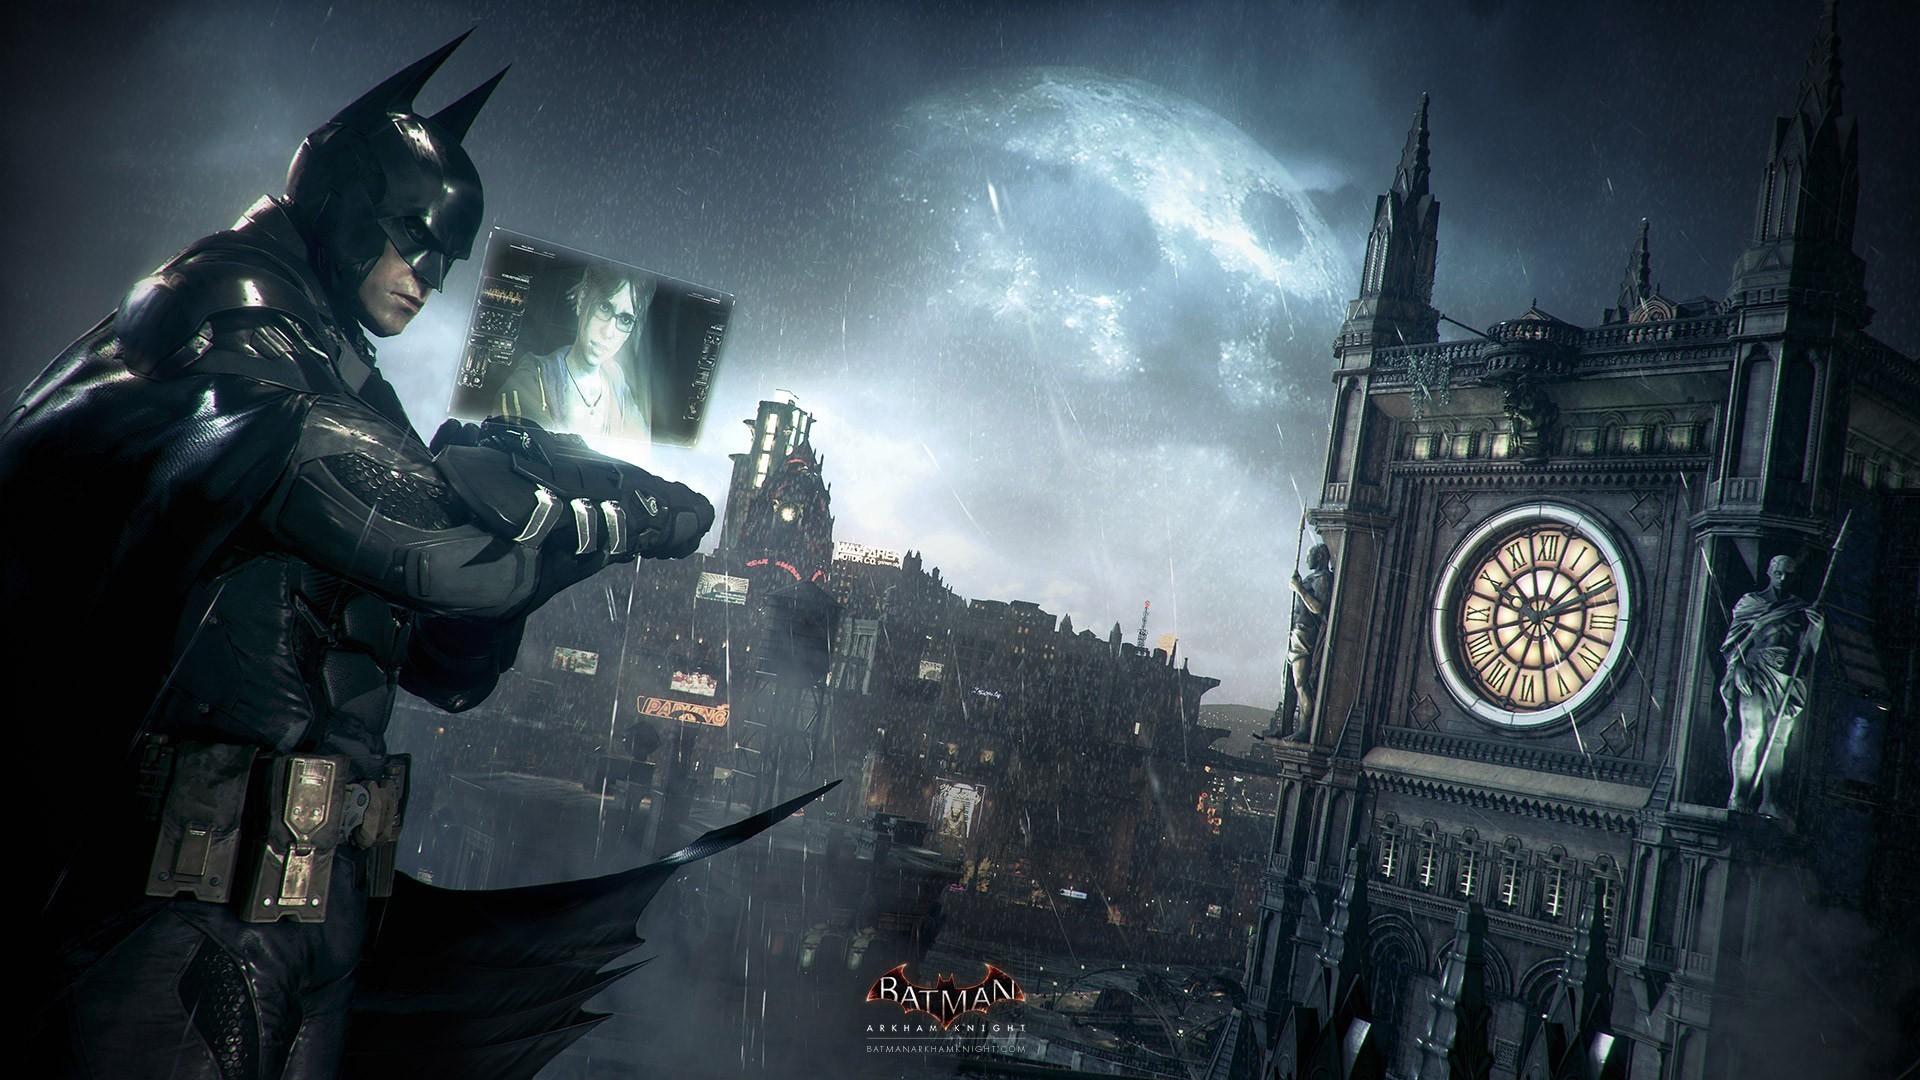 Batman: Arkham Knight Video Games 10 Background Wallpaper ...